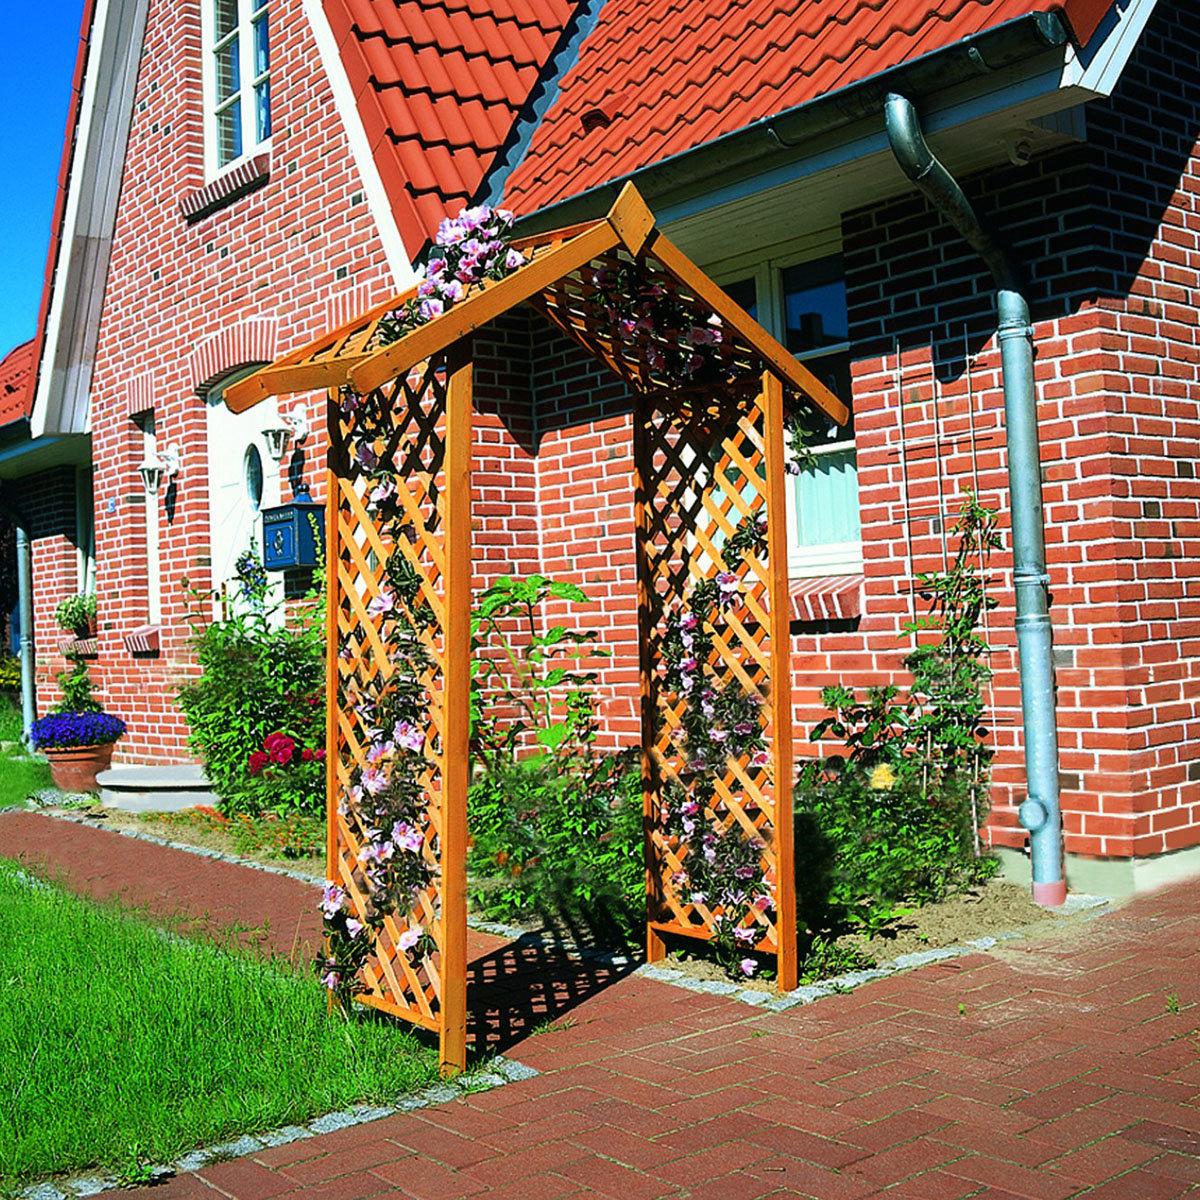 rosenbogen landhaus flair | von gärtner pötschke - Landhaus Flair